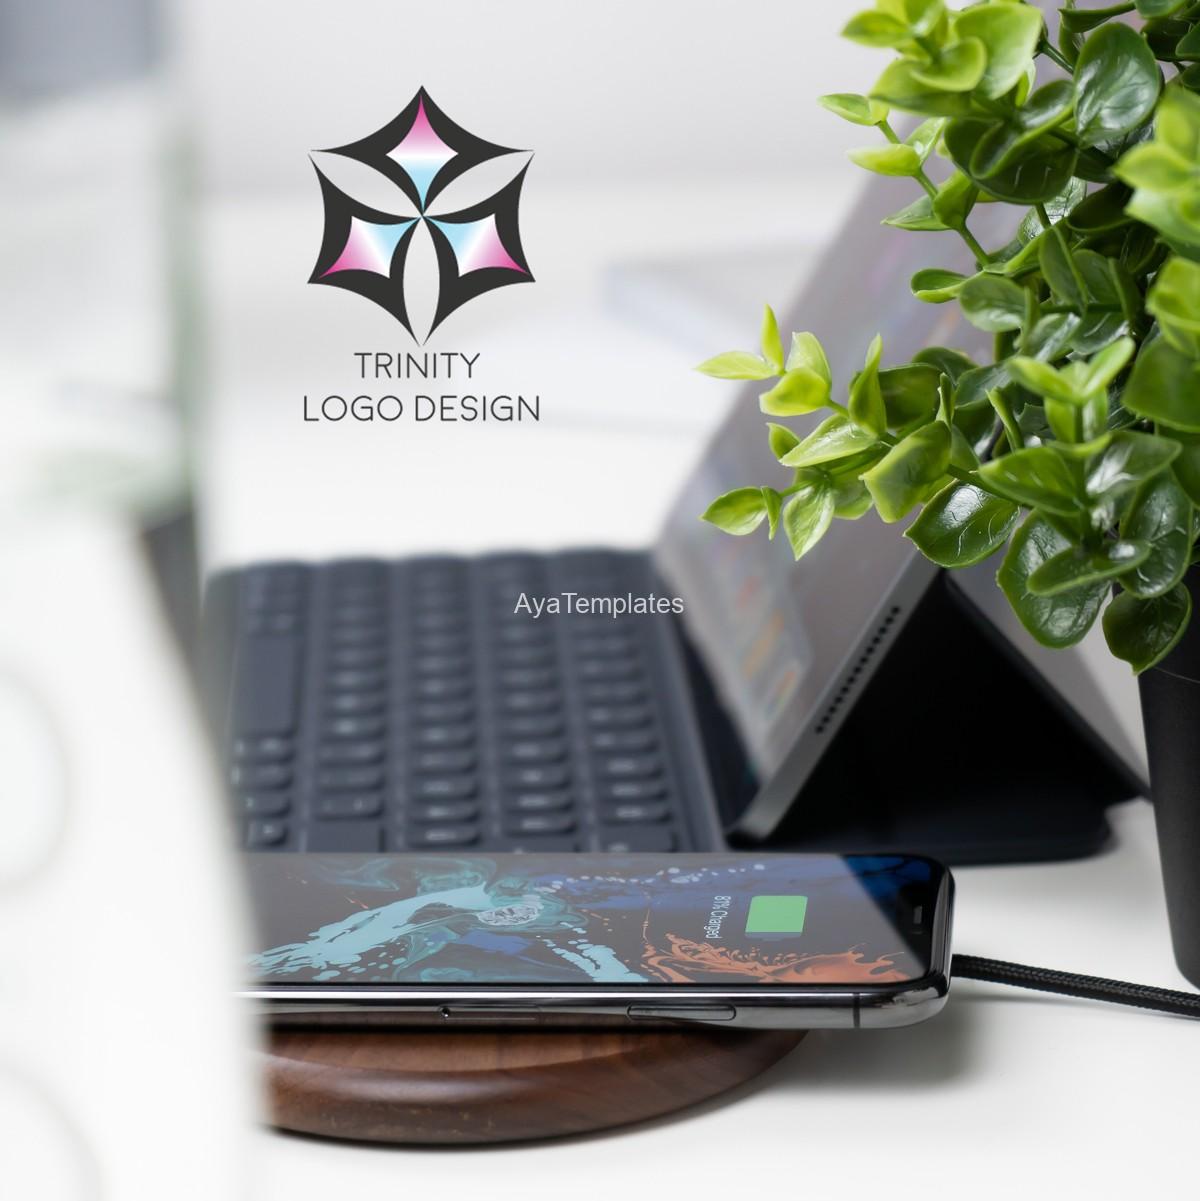 Trinity-logo-design-and-brand-identity-mockup